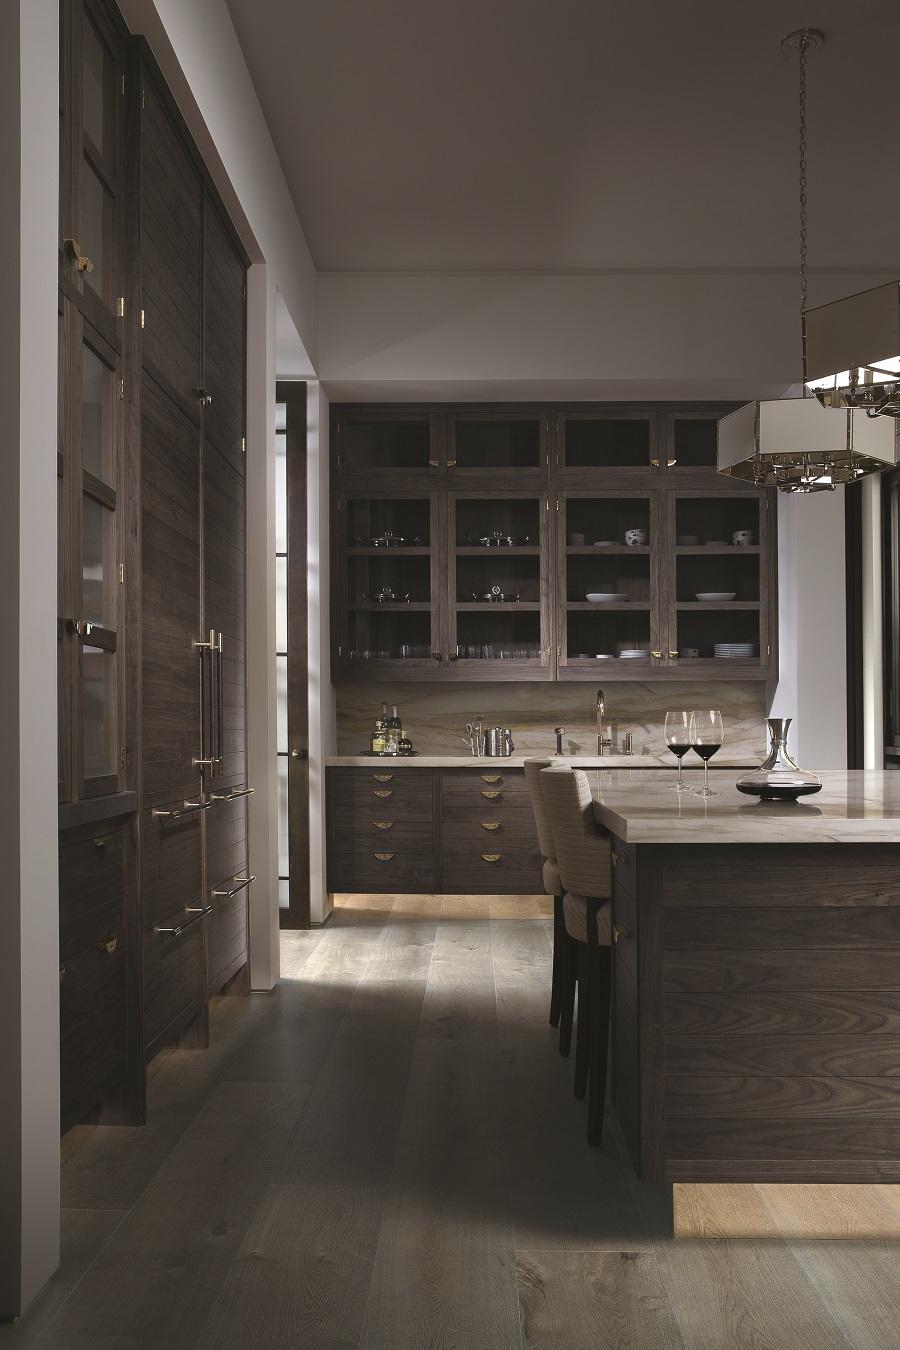 Kitchen Trends - Wood grain - sleek and elegant